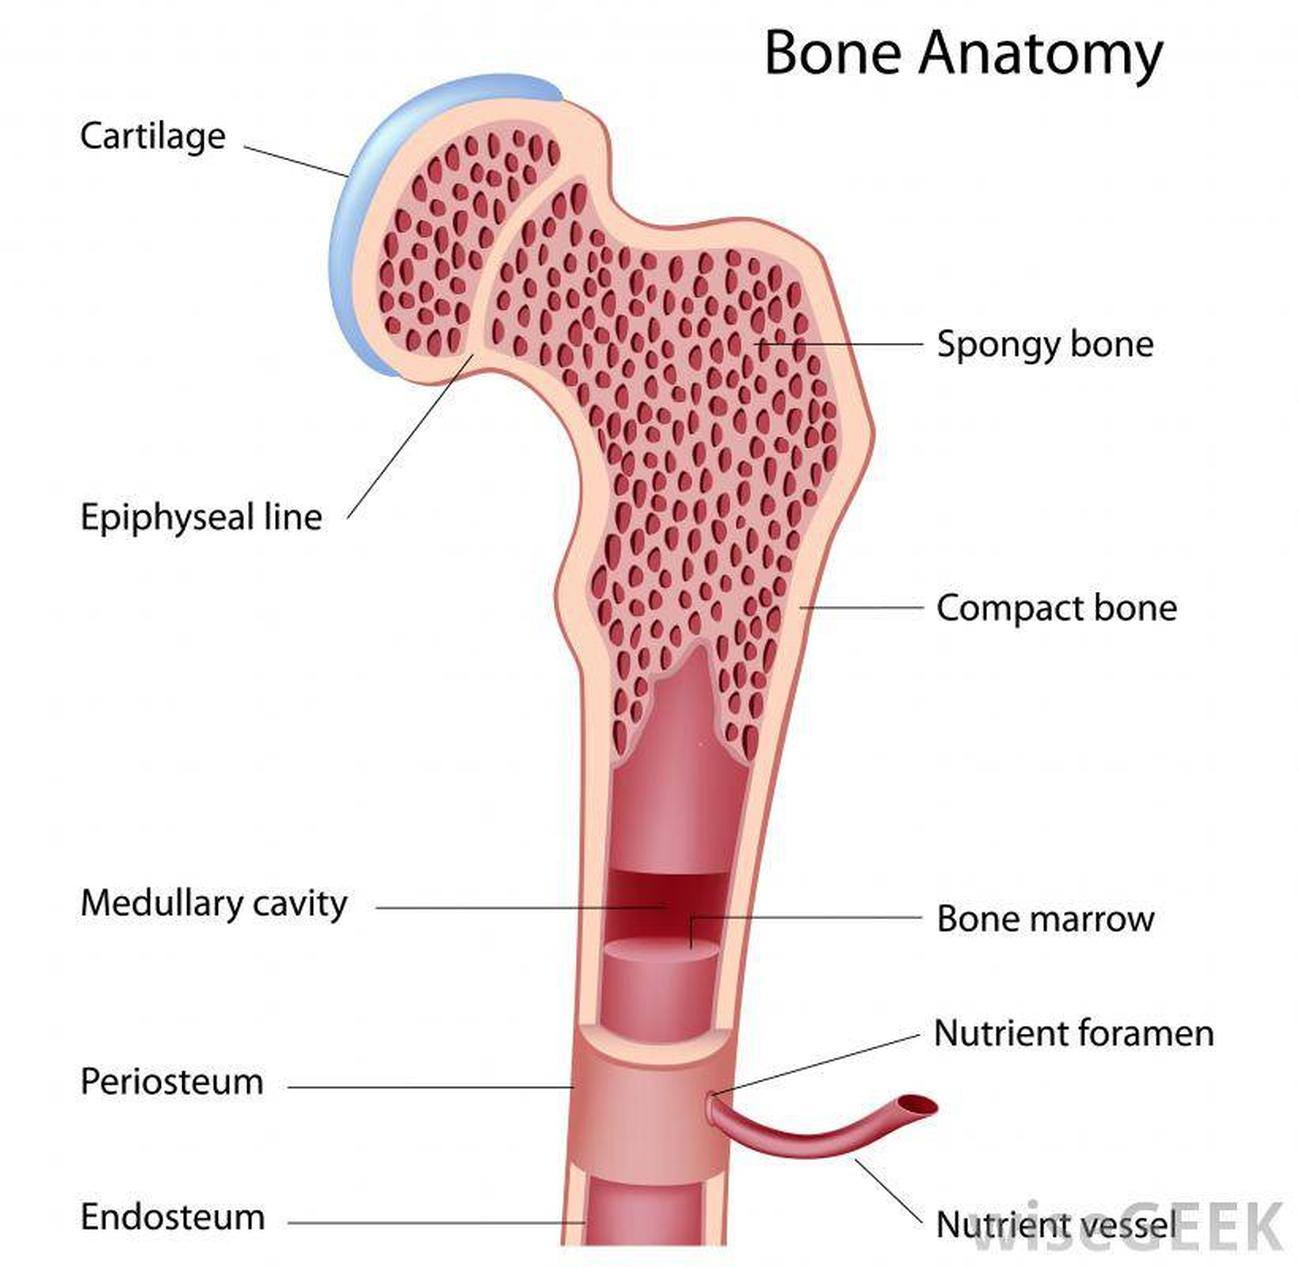 Pictures Of Bone Marrow